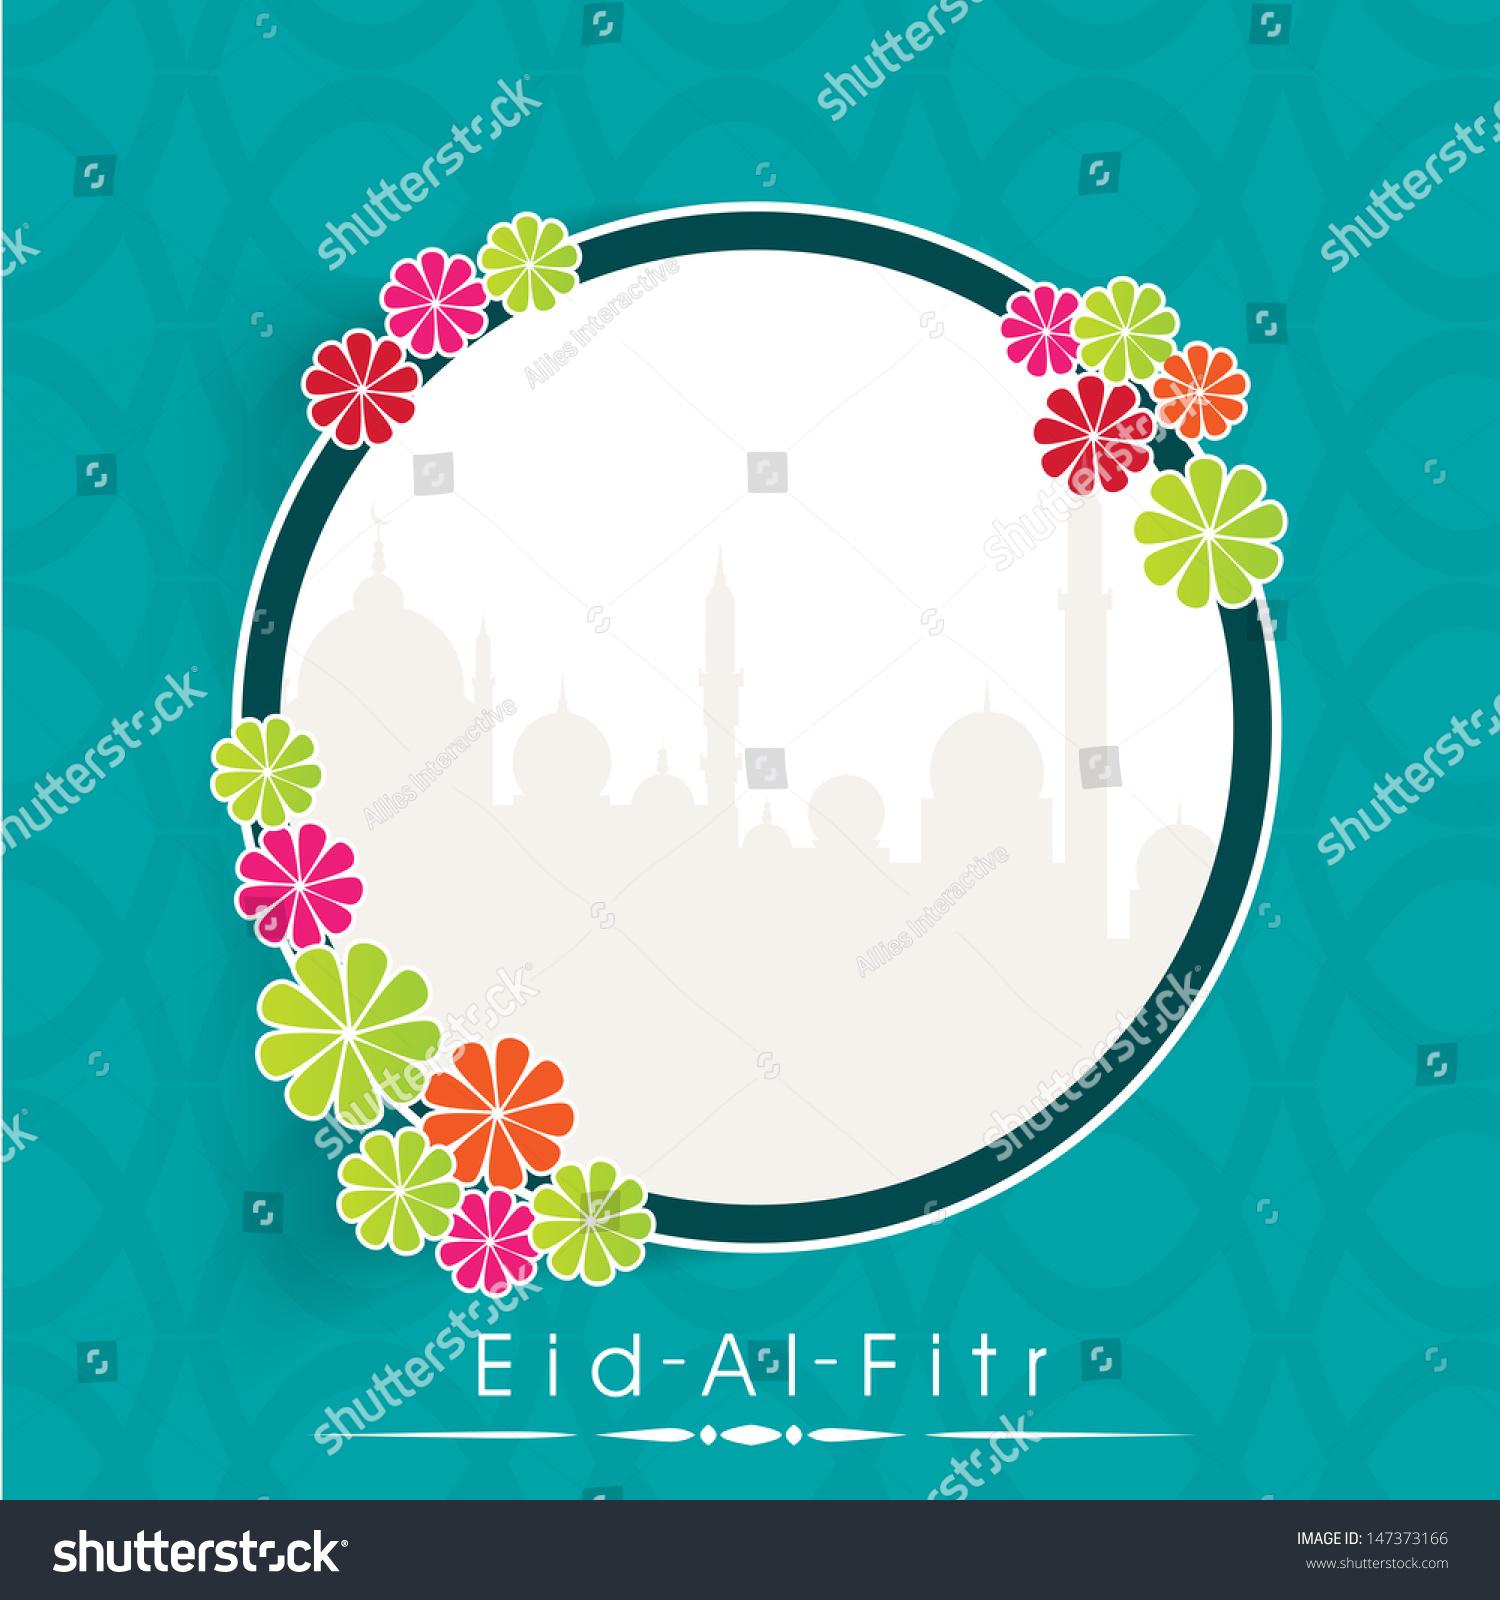 Fantastic Hajj Eid Al-Fitr Decorations - stock-vector-muslim-community-festival-eid-al-fitr-eid-mubarak-concept-with-creative-mosque-design-on-floral-147373166  Photograph_975466 .jpg